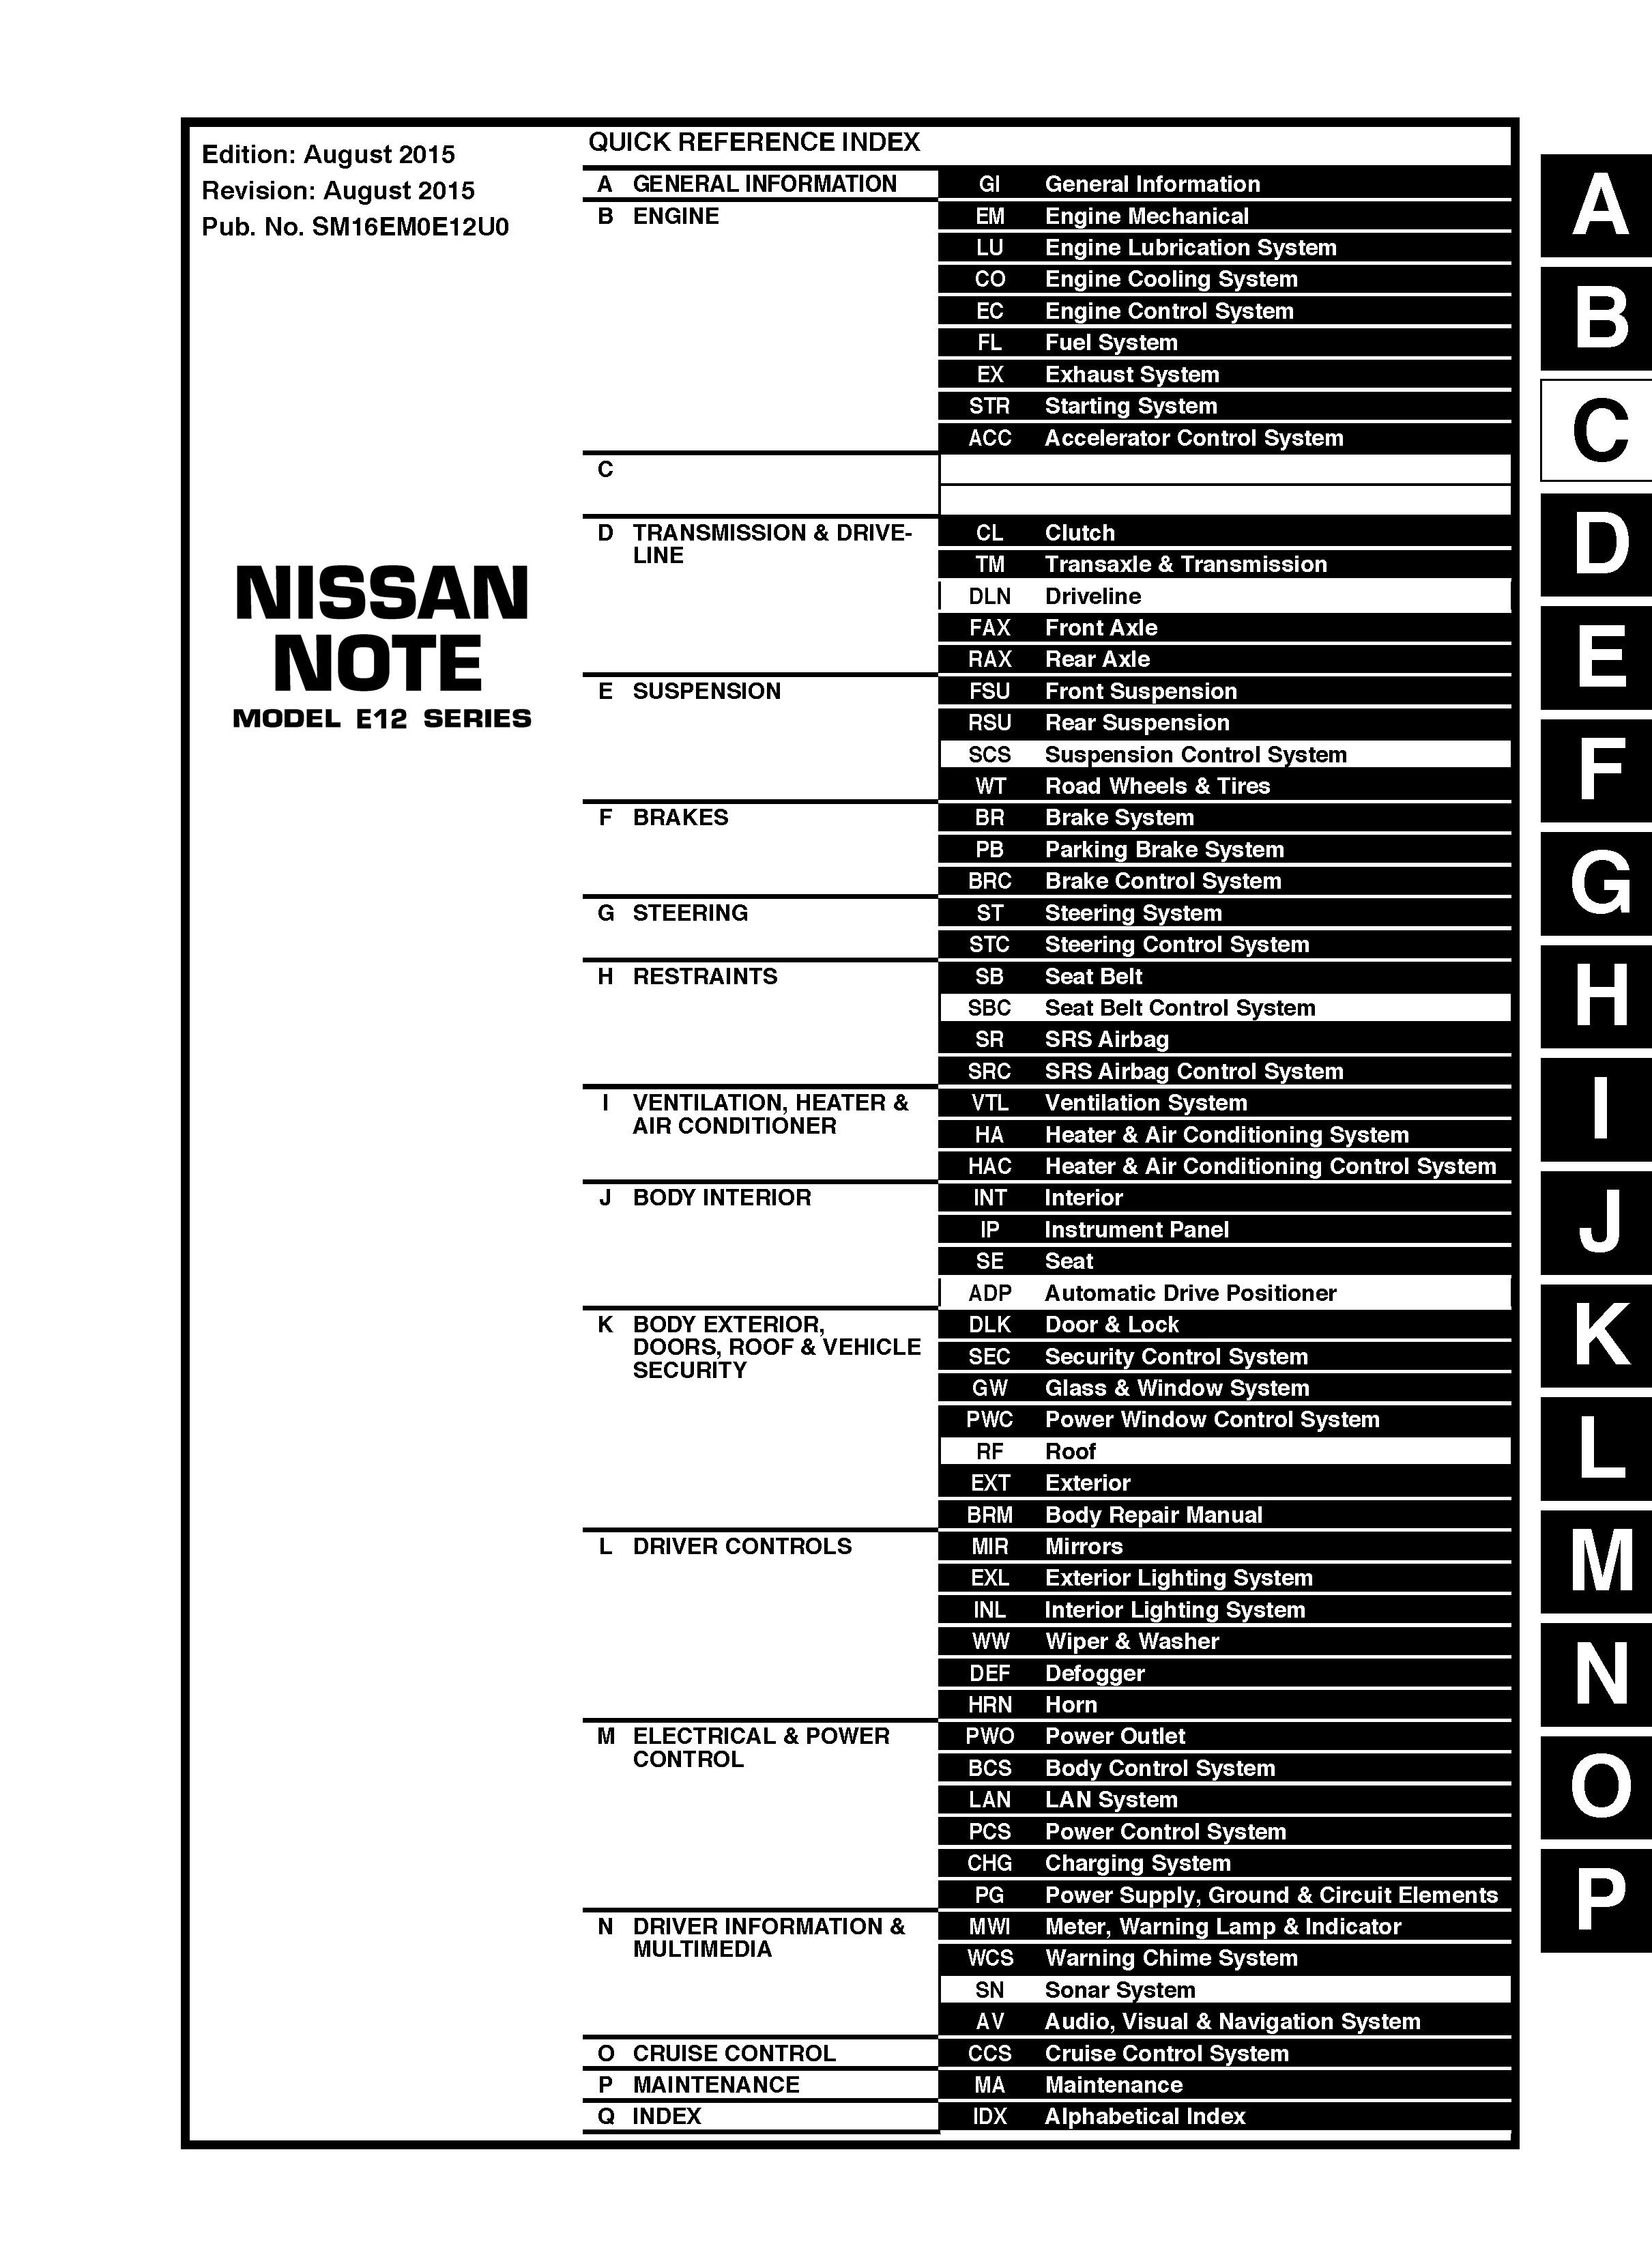 2016 nissan versa note model e12 series oem service and repair rh pinterest com sonoline versa plus service manual nissan versa service manual 2008